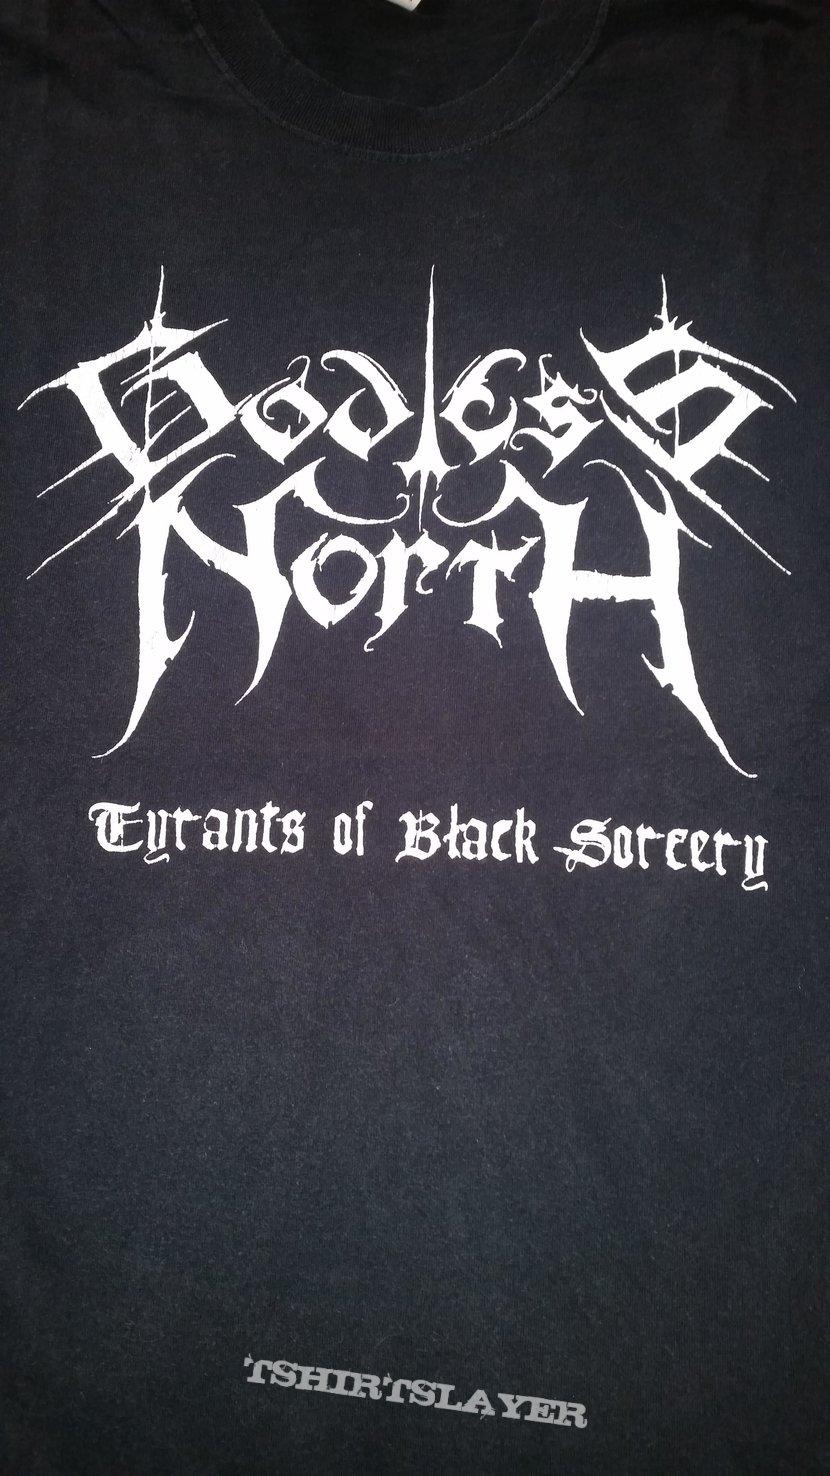 Godless North - Tyrants of black sorcery